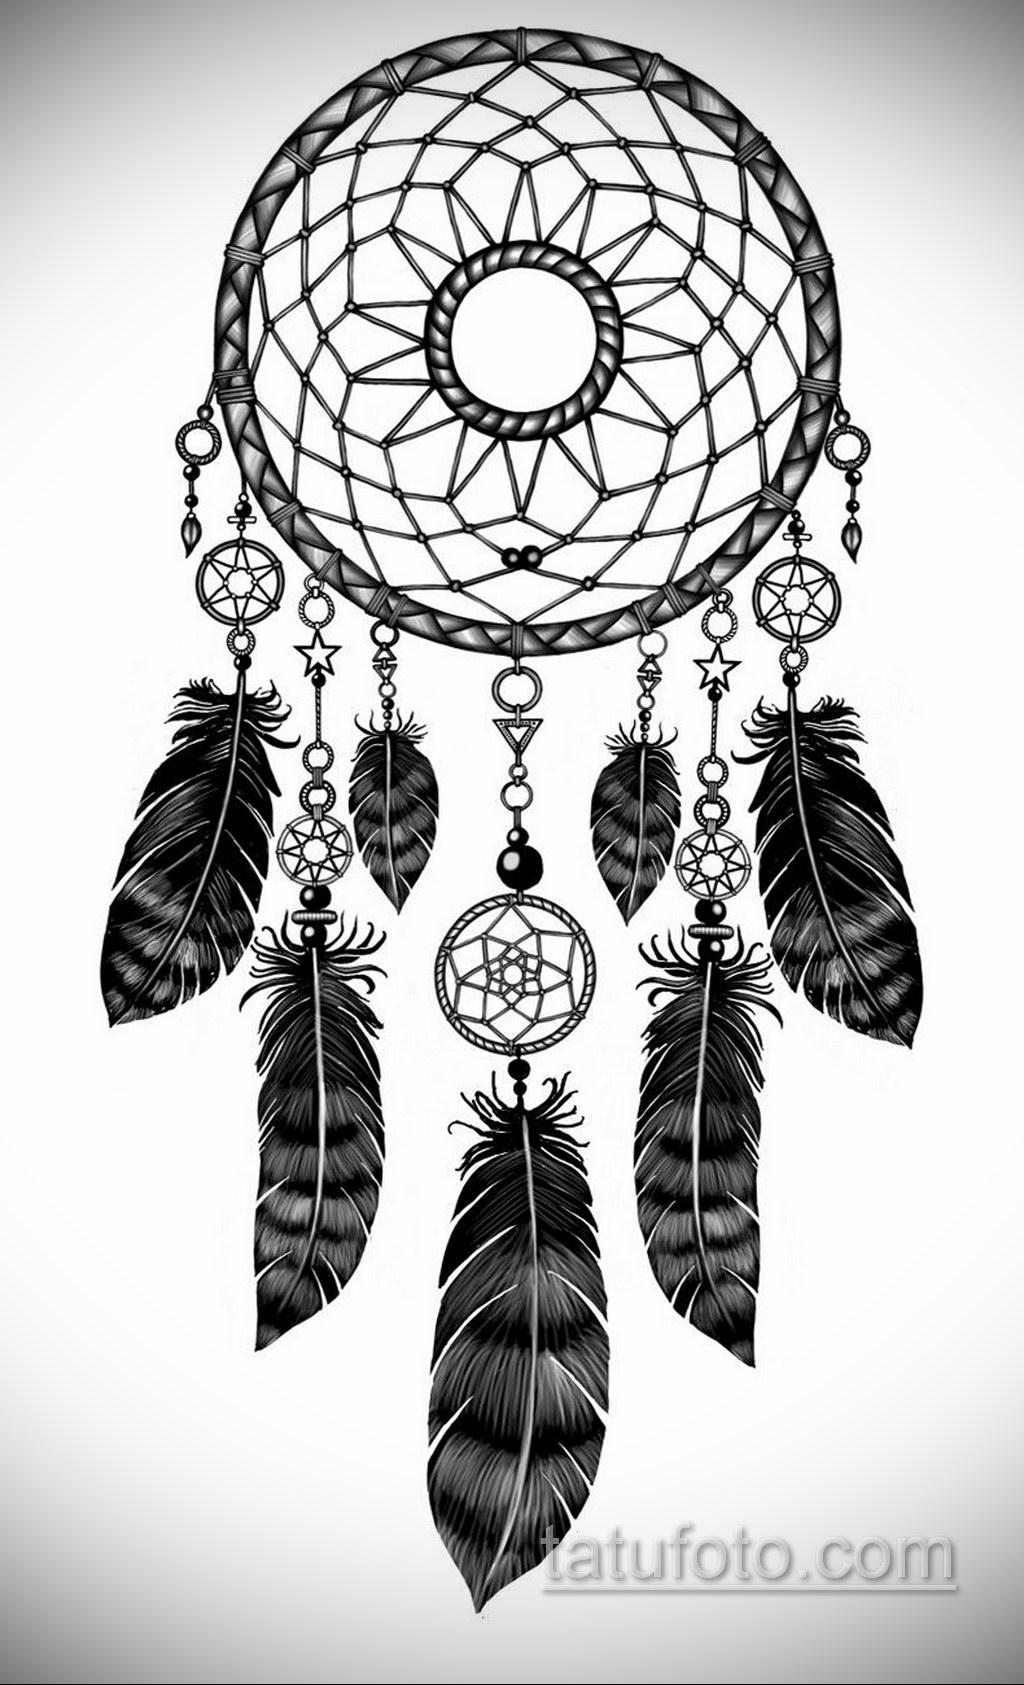 Фото рисунка тату с ловцом снов 22.11.2020 №059 -Dreamcatcher tattoo- tatufoto.com